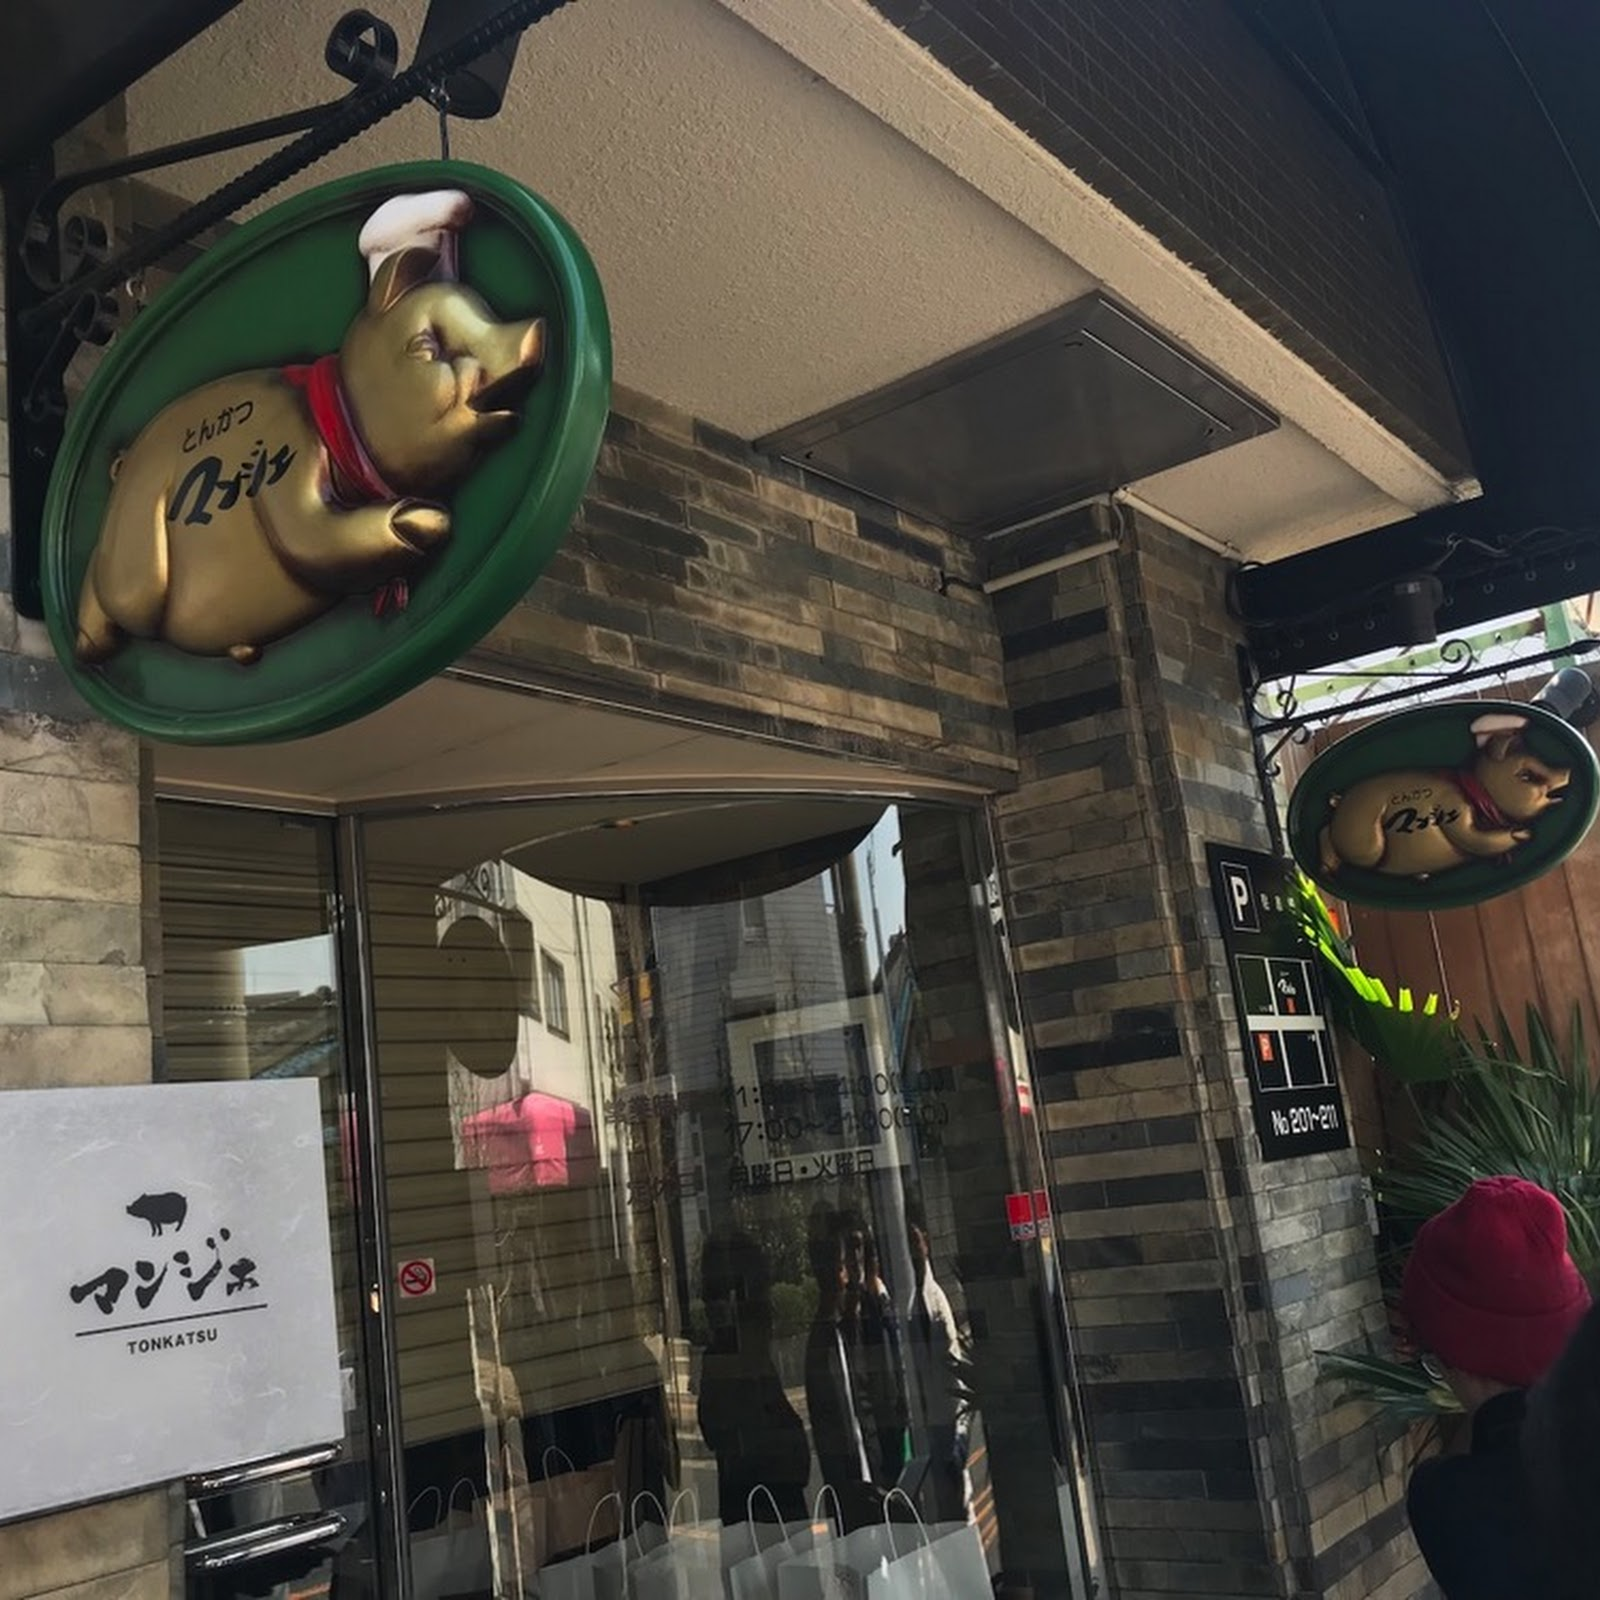 老娘遊記 2018 (06 – 16 March) @ 關西 Day 10(1) 豬排manger 早午餐